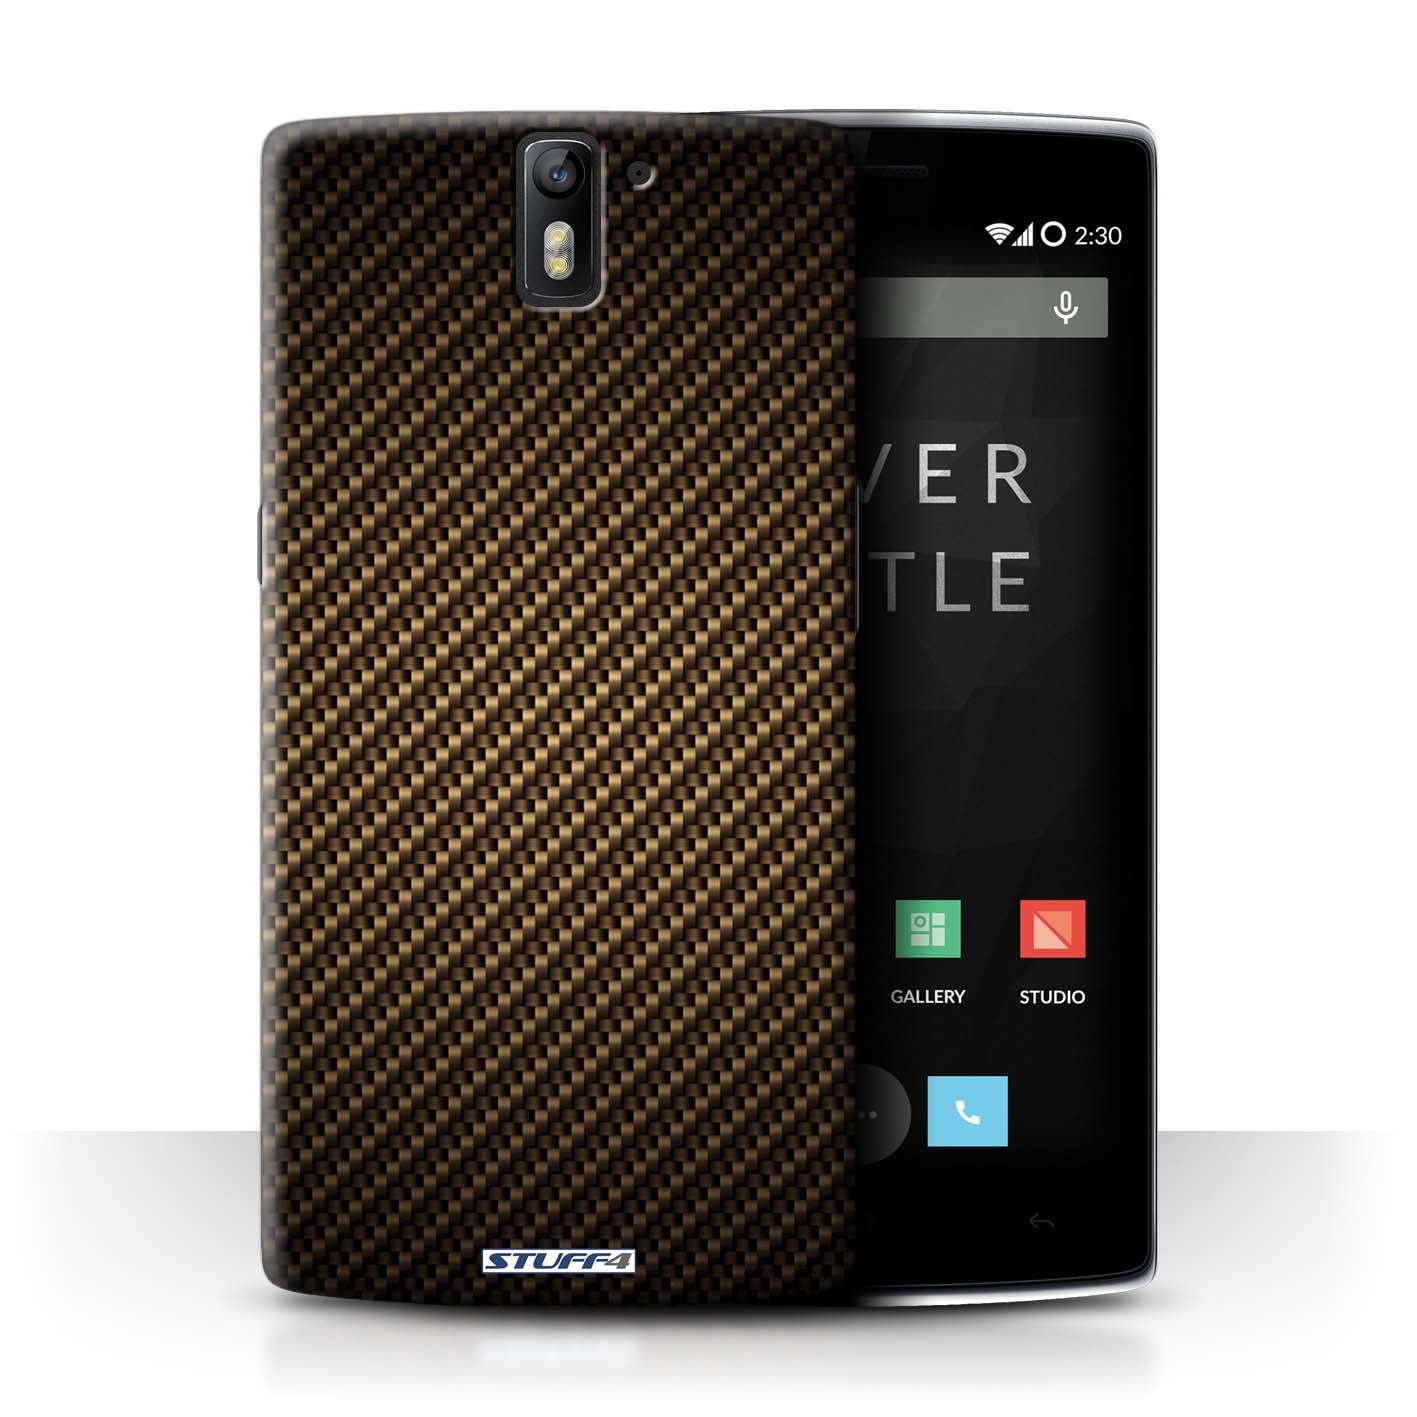 STUFF4-Coque-Etui-pour-OnePlus-Smartphone-Motif-de-Fibre-de-Carbone-Housse